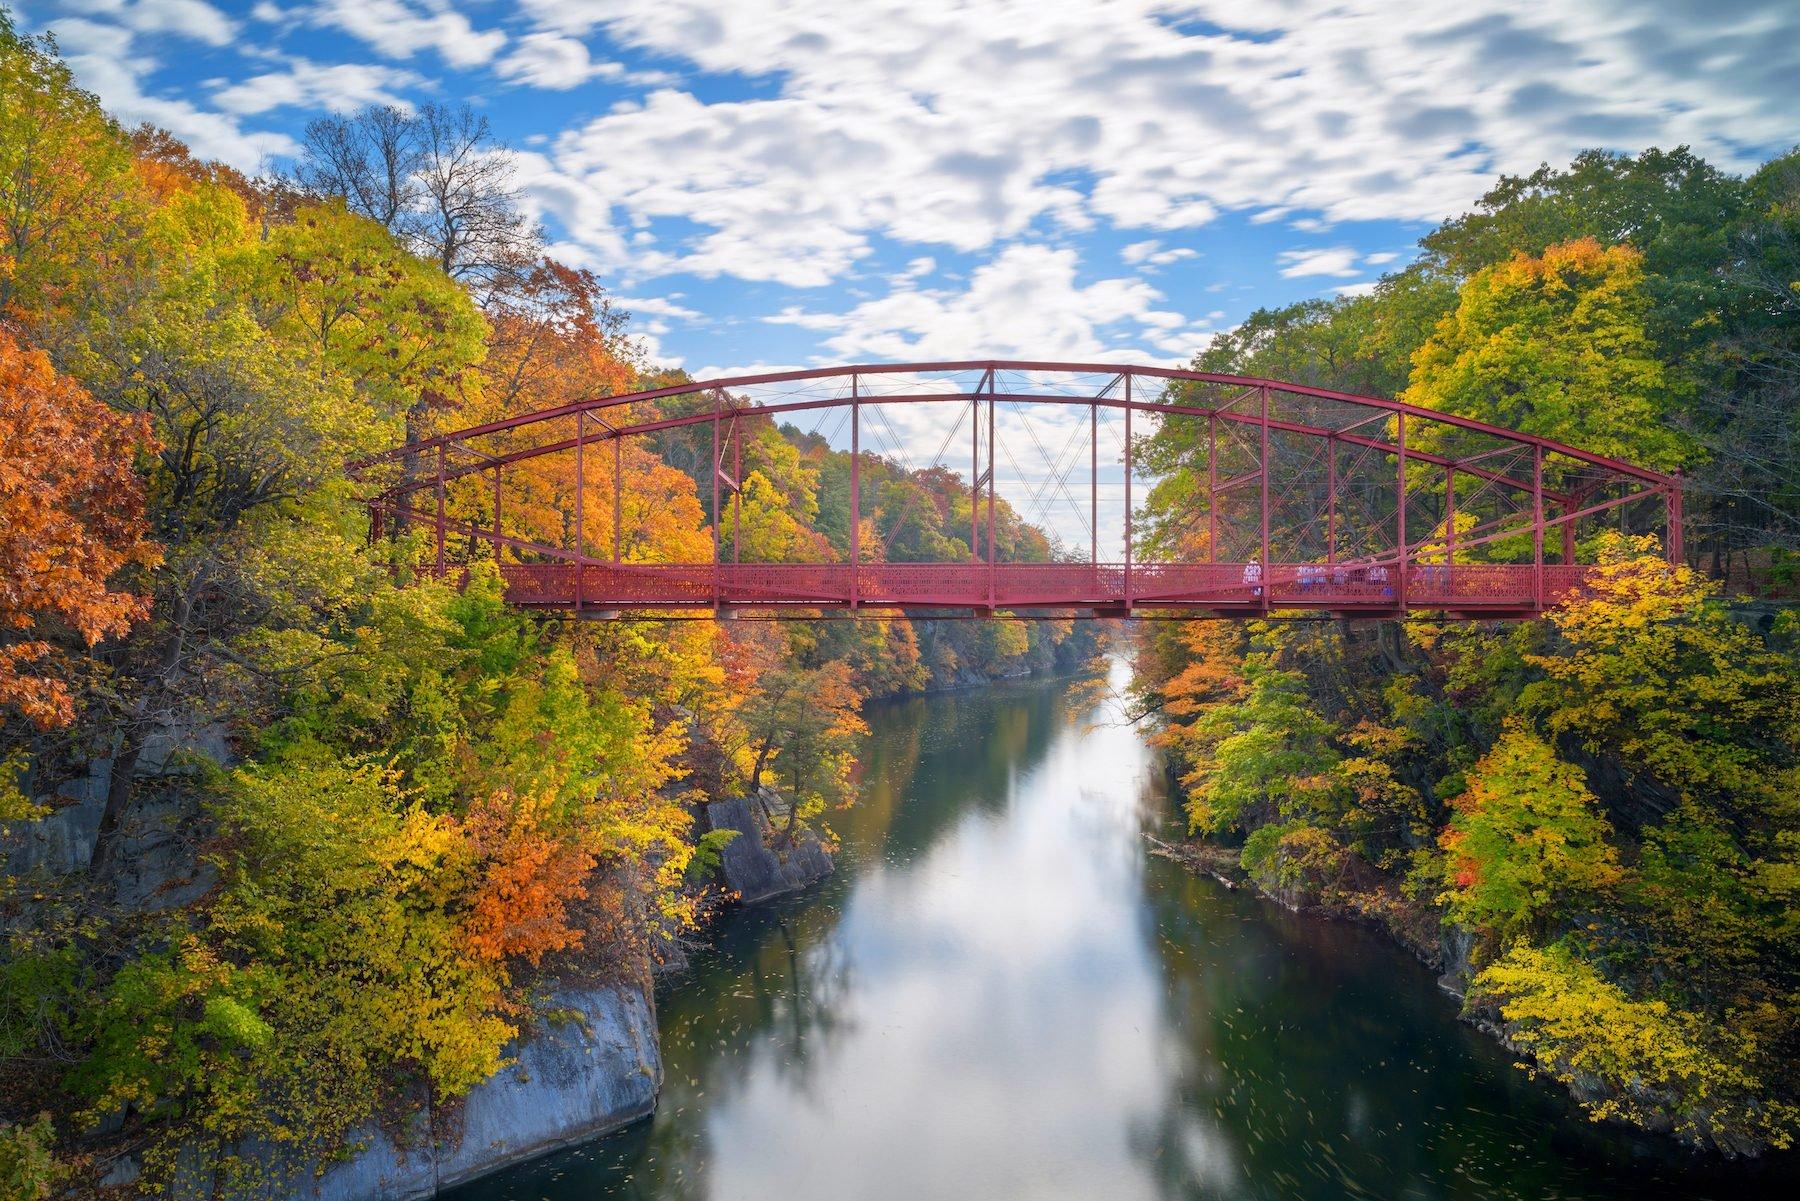 Lover's Leap Bridge, New Milford, Connecticut